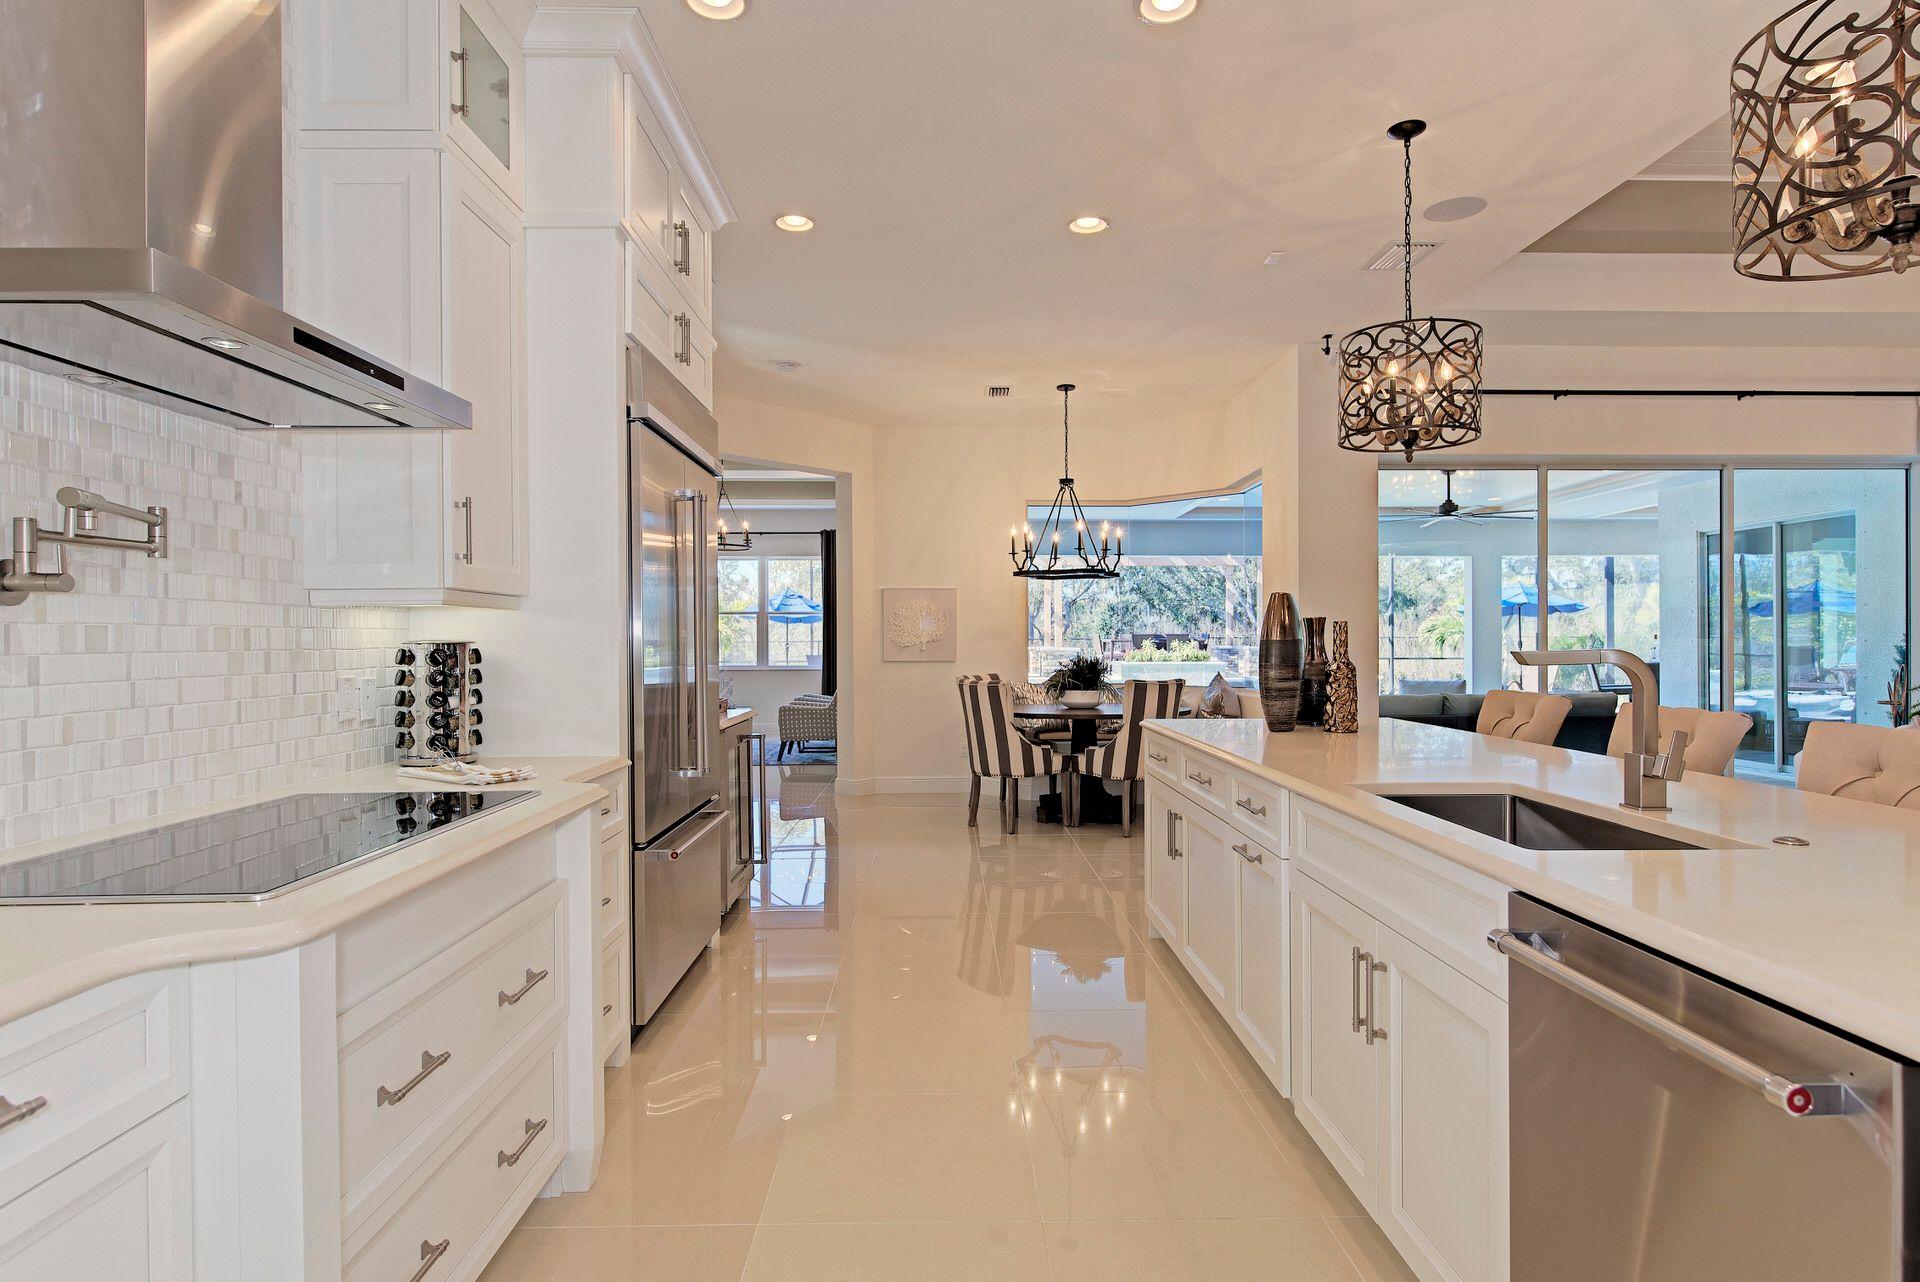 Kitchen featured in the Santa Maria By Medallion Home in Sarasota-Bradenton, FL